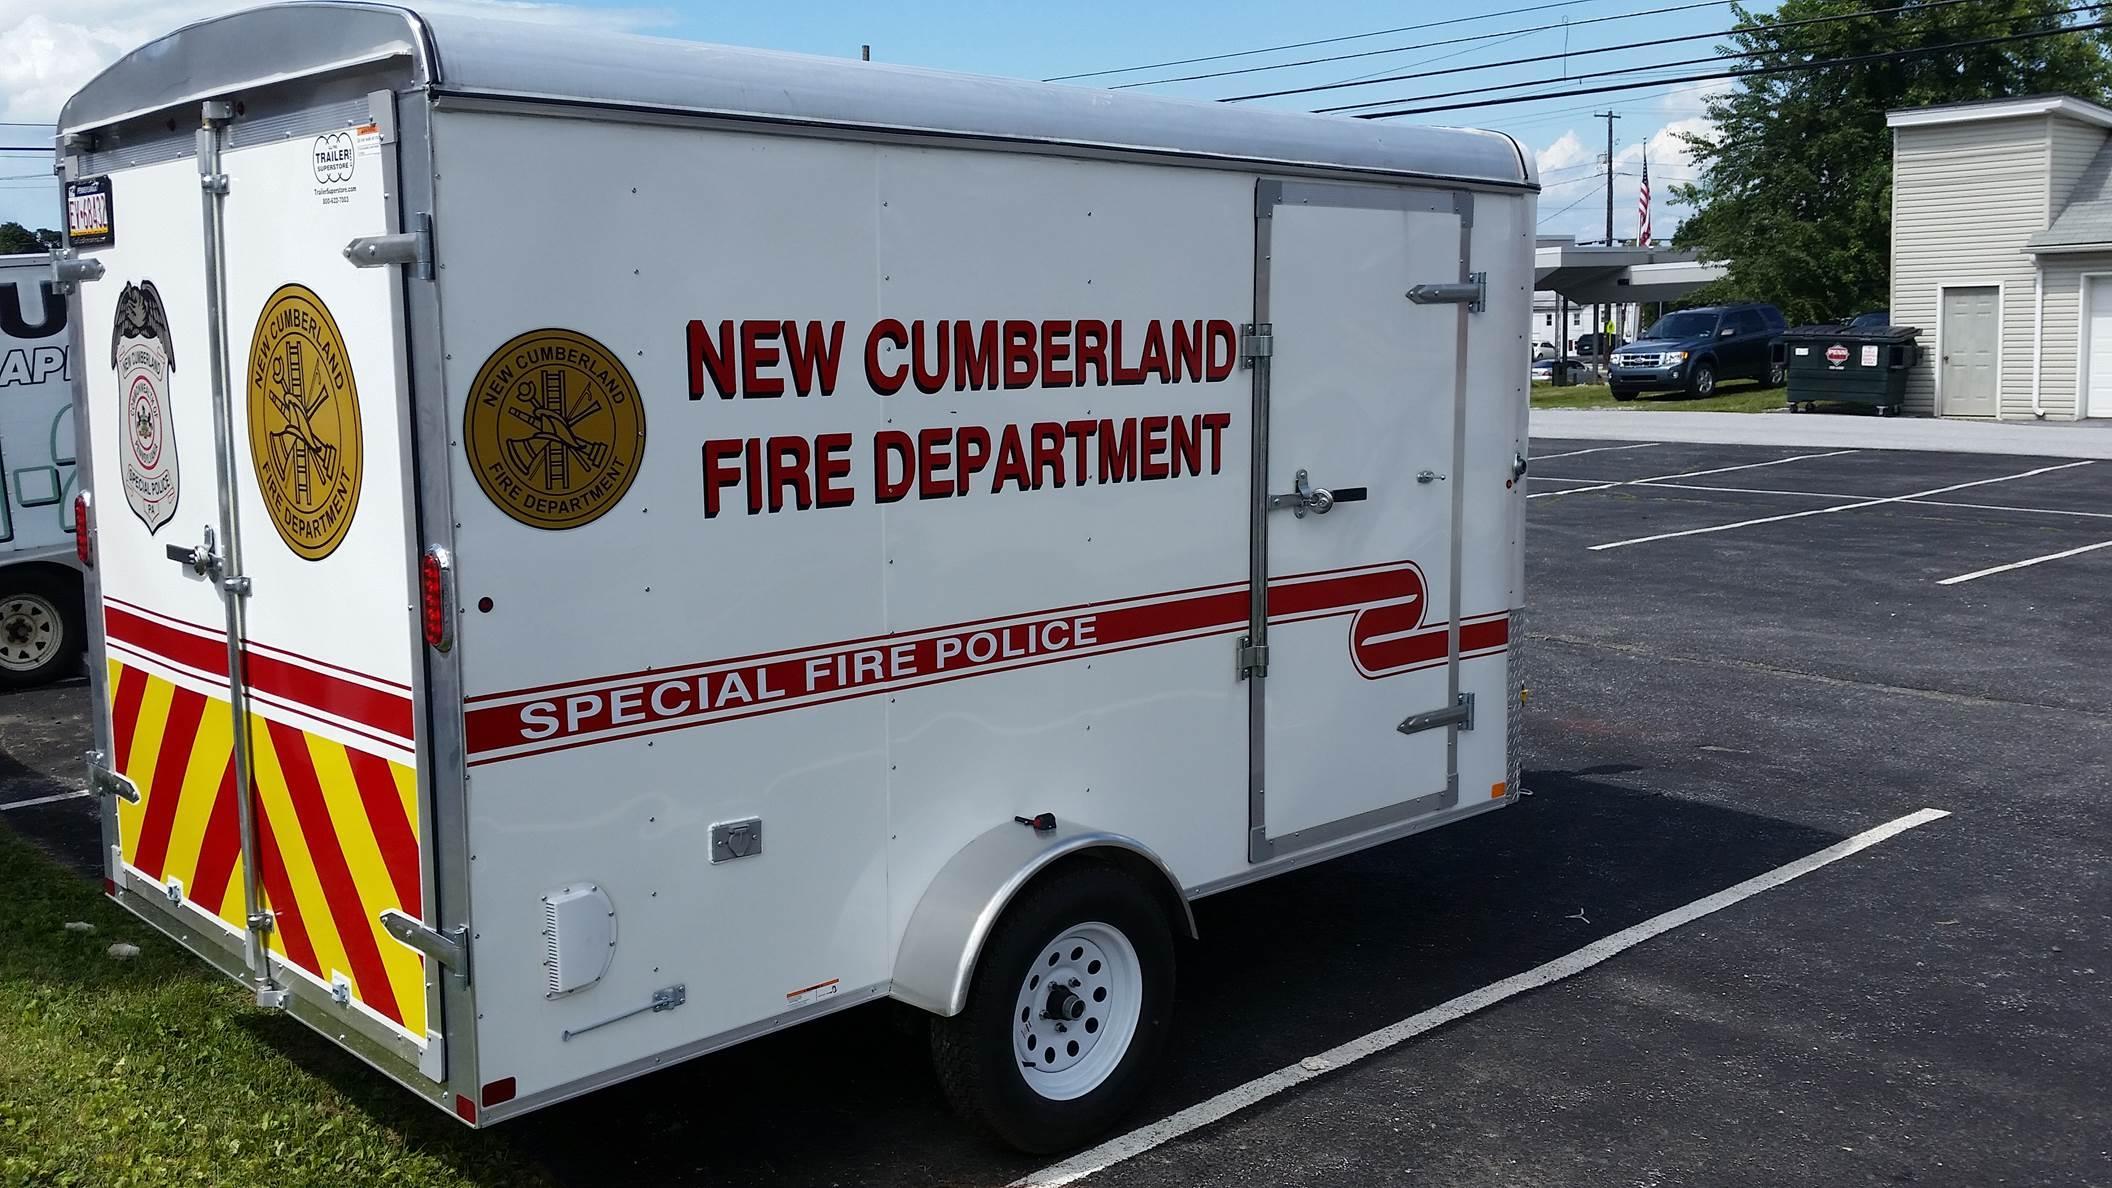 New Cumberland Fire Department PA Traffic Trailer